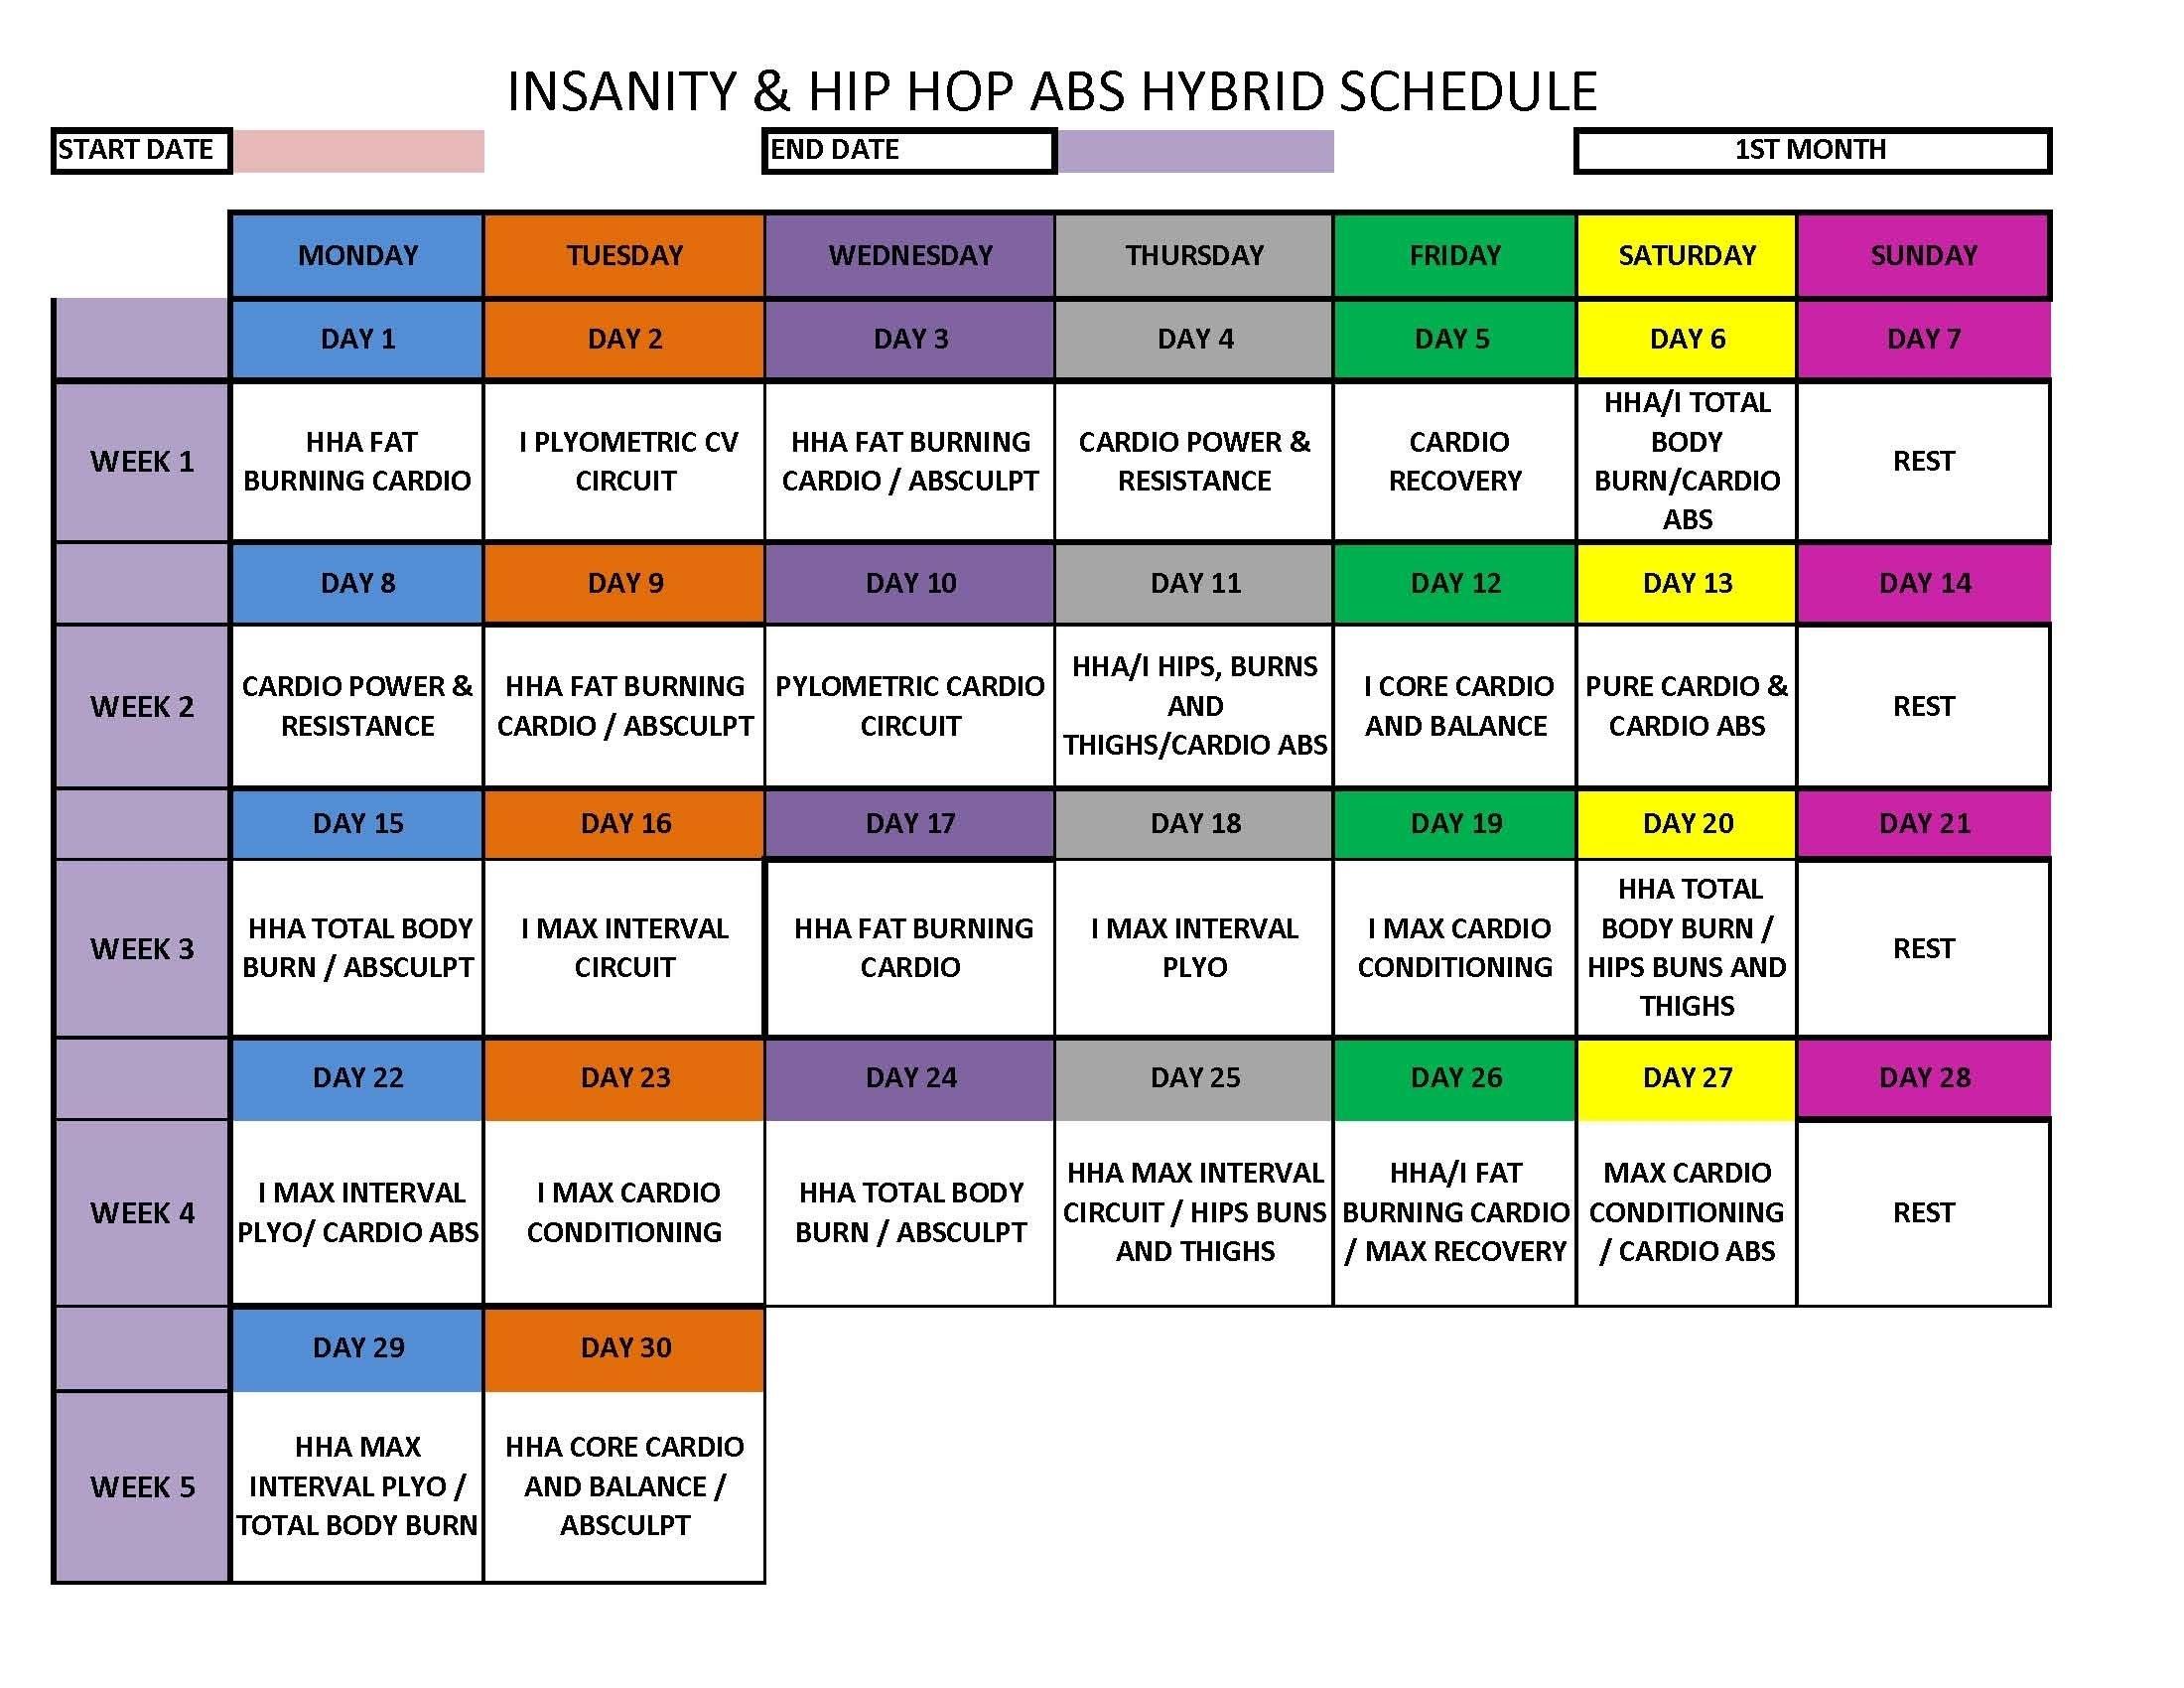 Insanity - Hip Hop Abs Hybrid Schedule | Hip Hop Abs, Hip